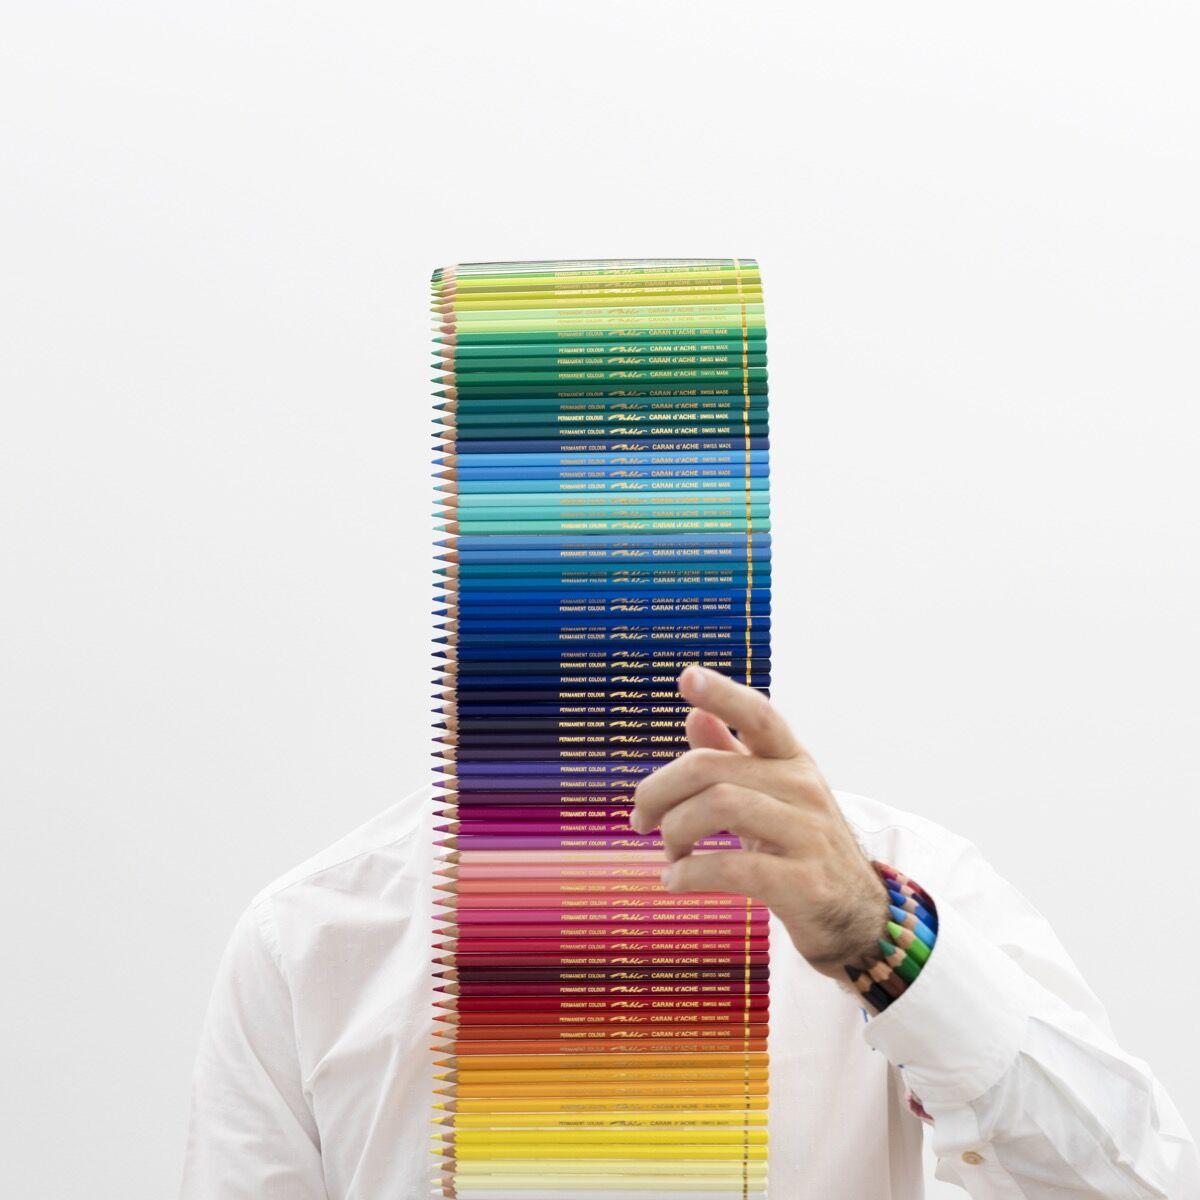 José Lourenço, What color should I use?, 2017. Courtesy of the artist.